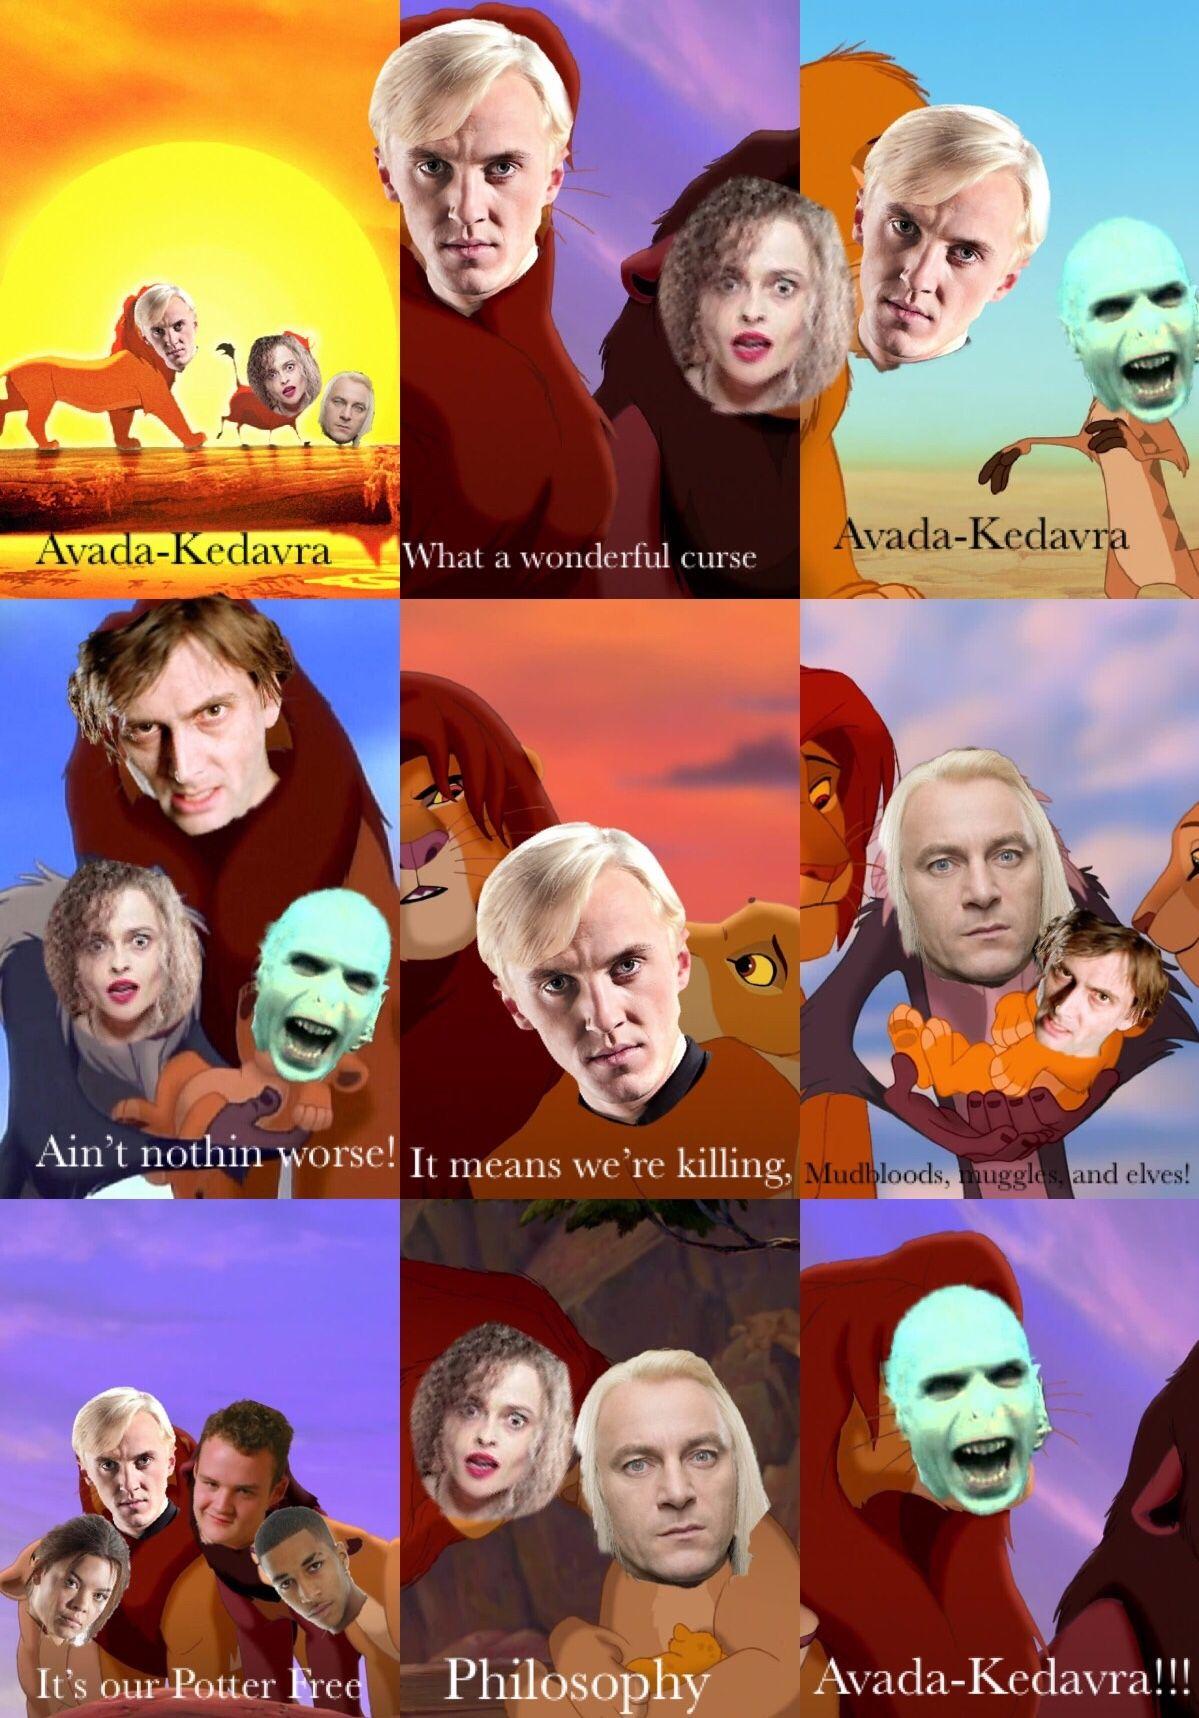 Harry Potter Humor Keyboard Funny Text Avada Kedavra Lustige Harry Potter Memes Voldemort Harry Potter Zitate